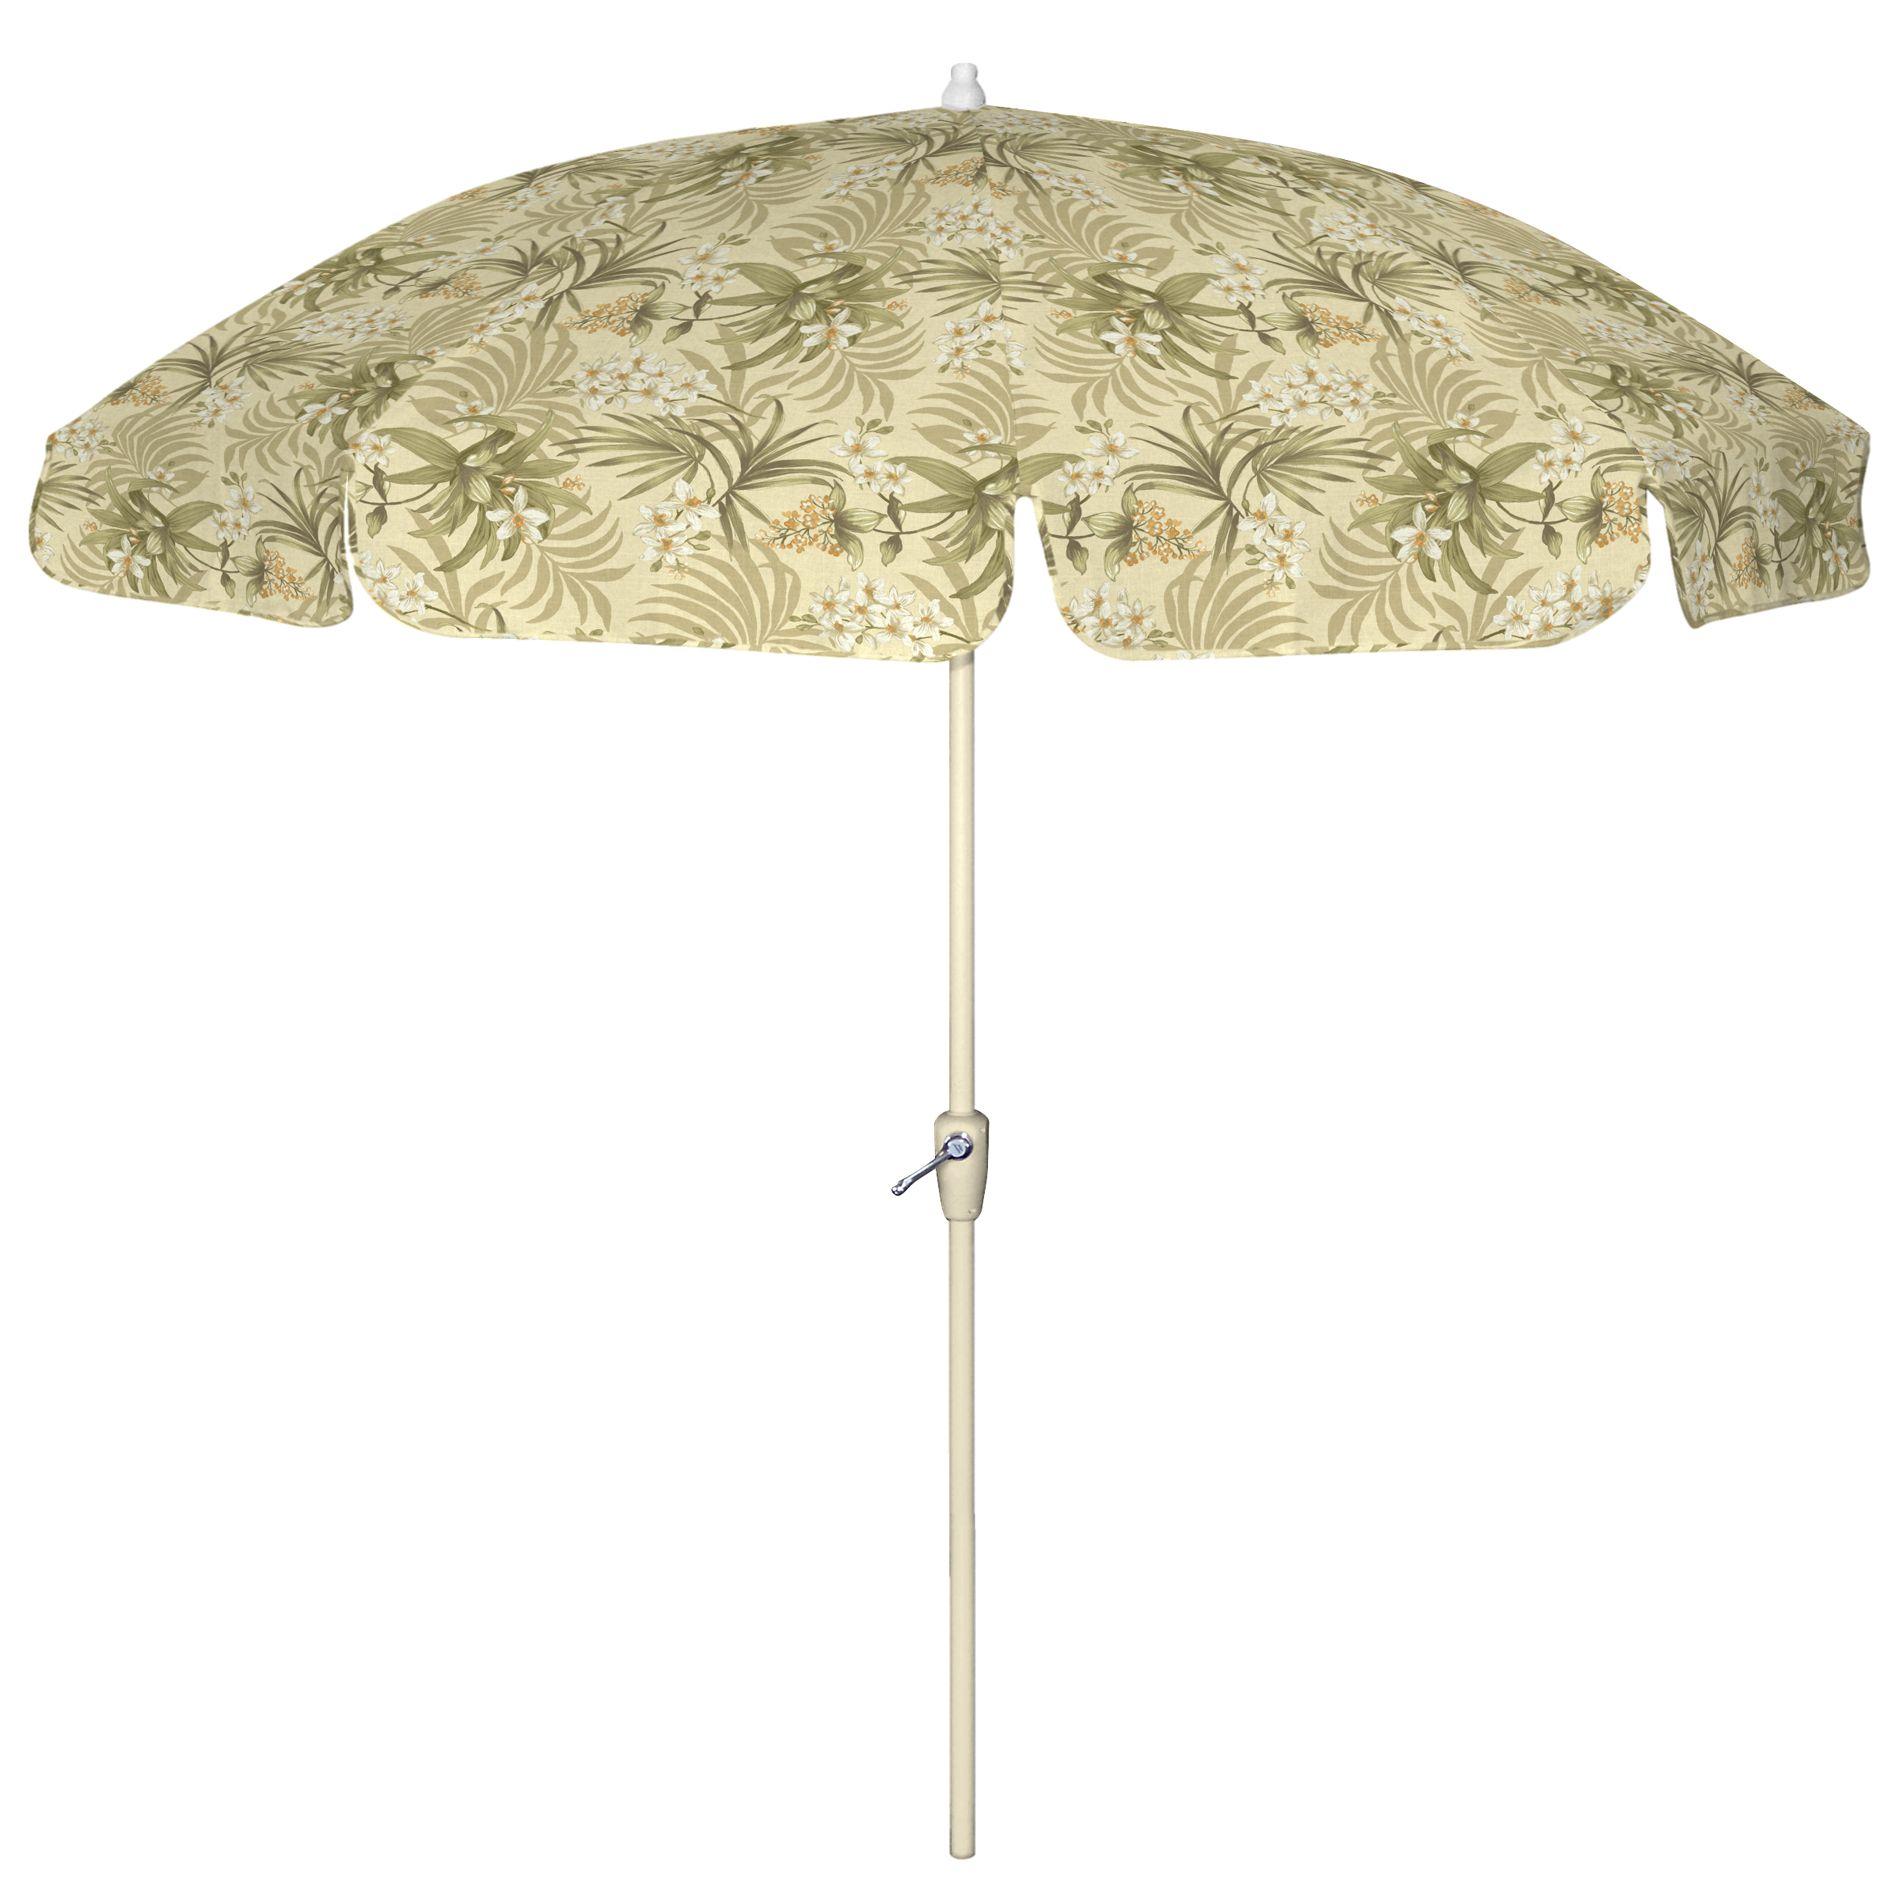 Arden Outdoor 7 1 2 Ft Patio Umbrella Doreena Twilight